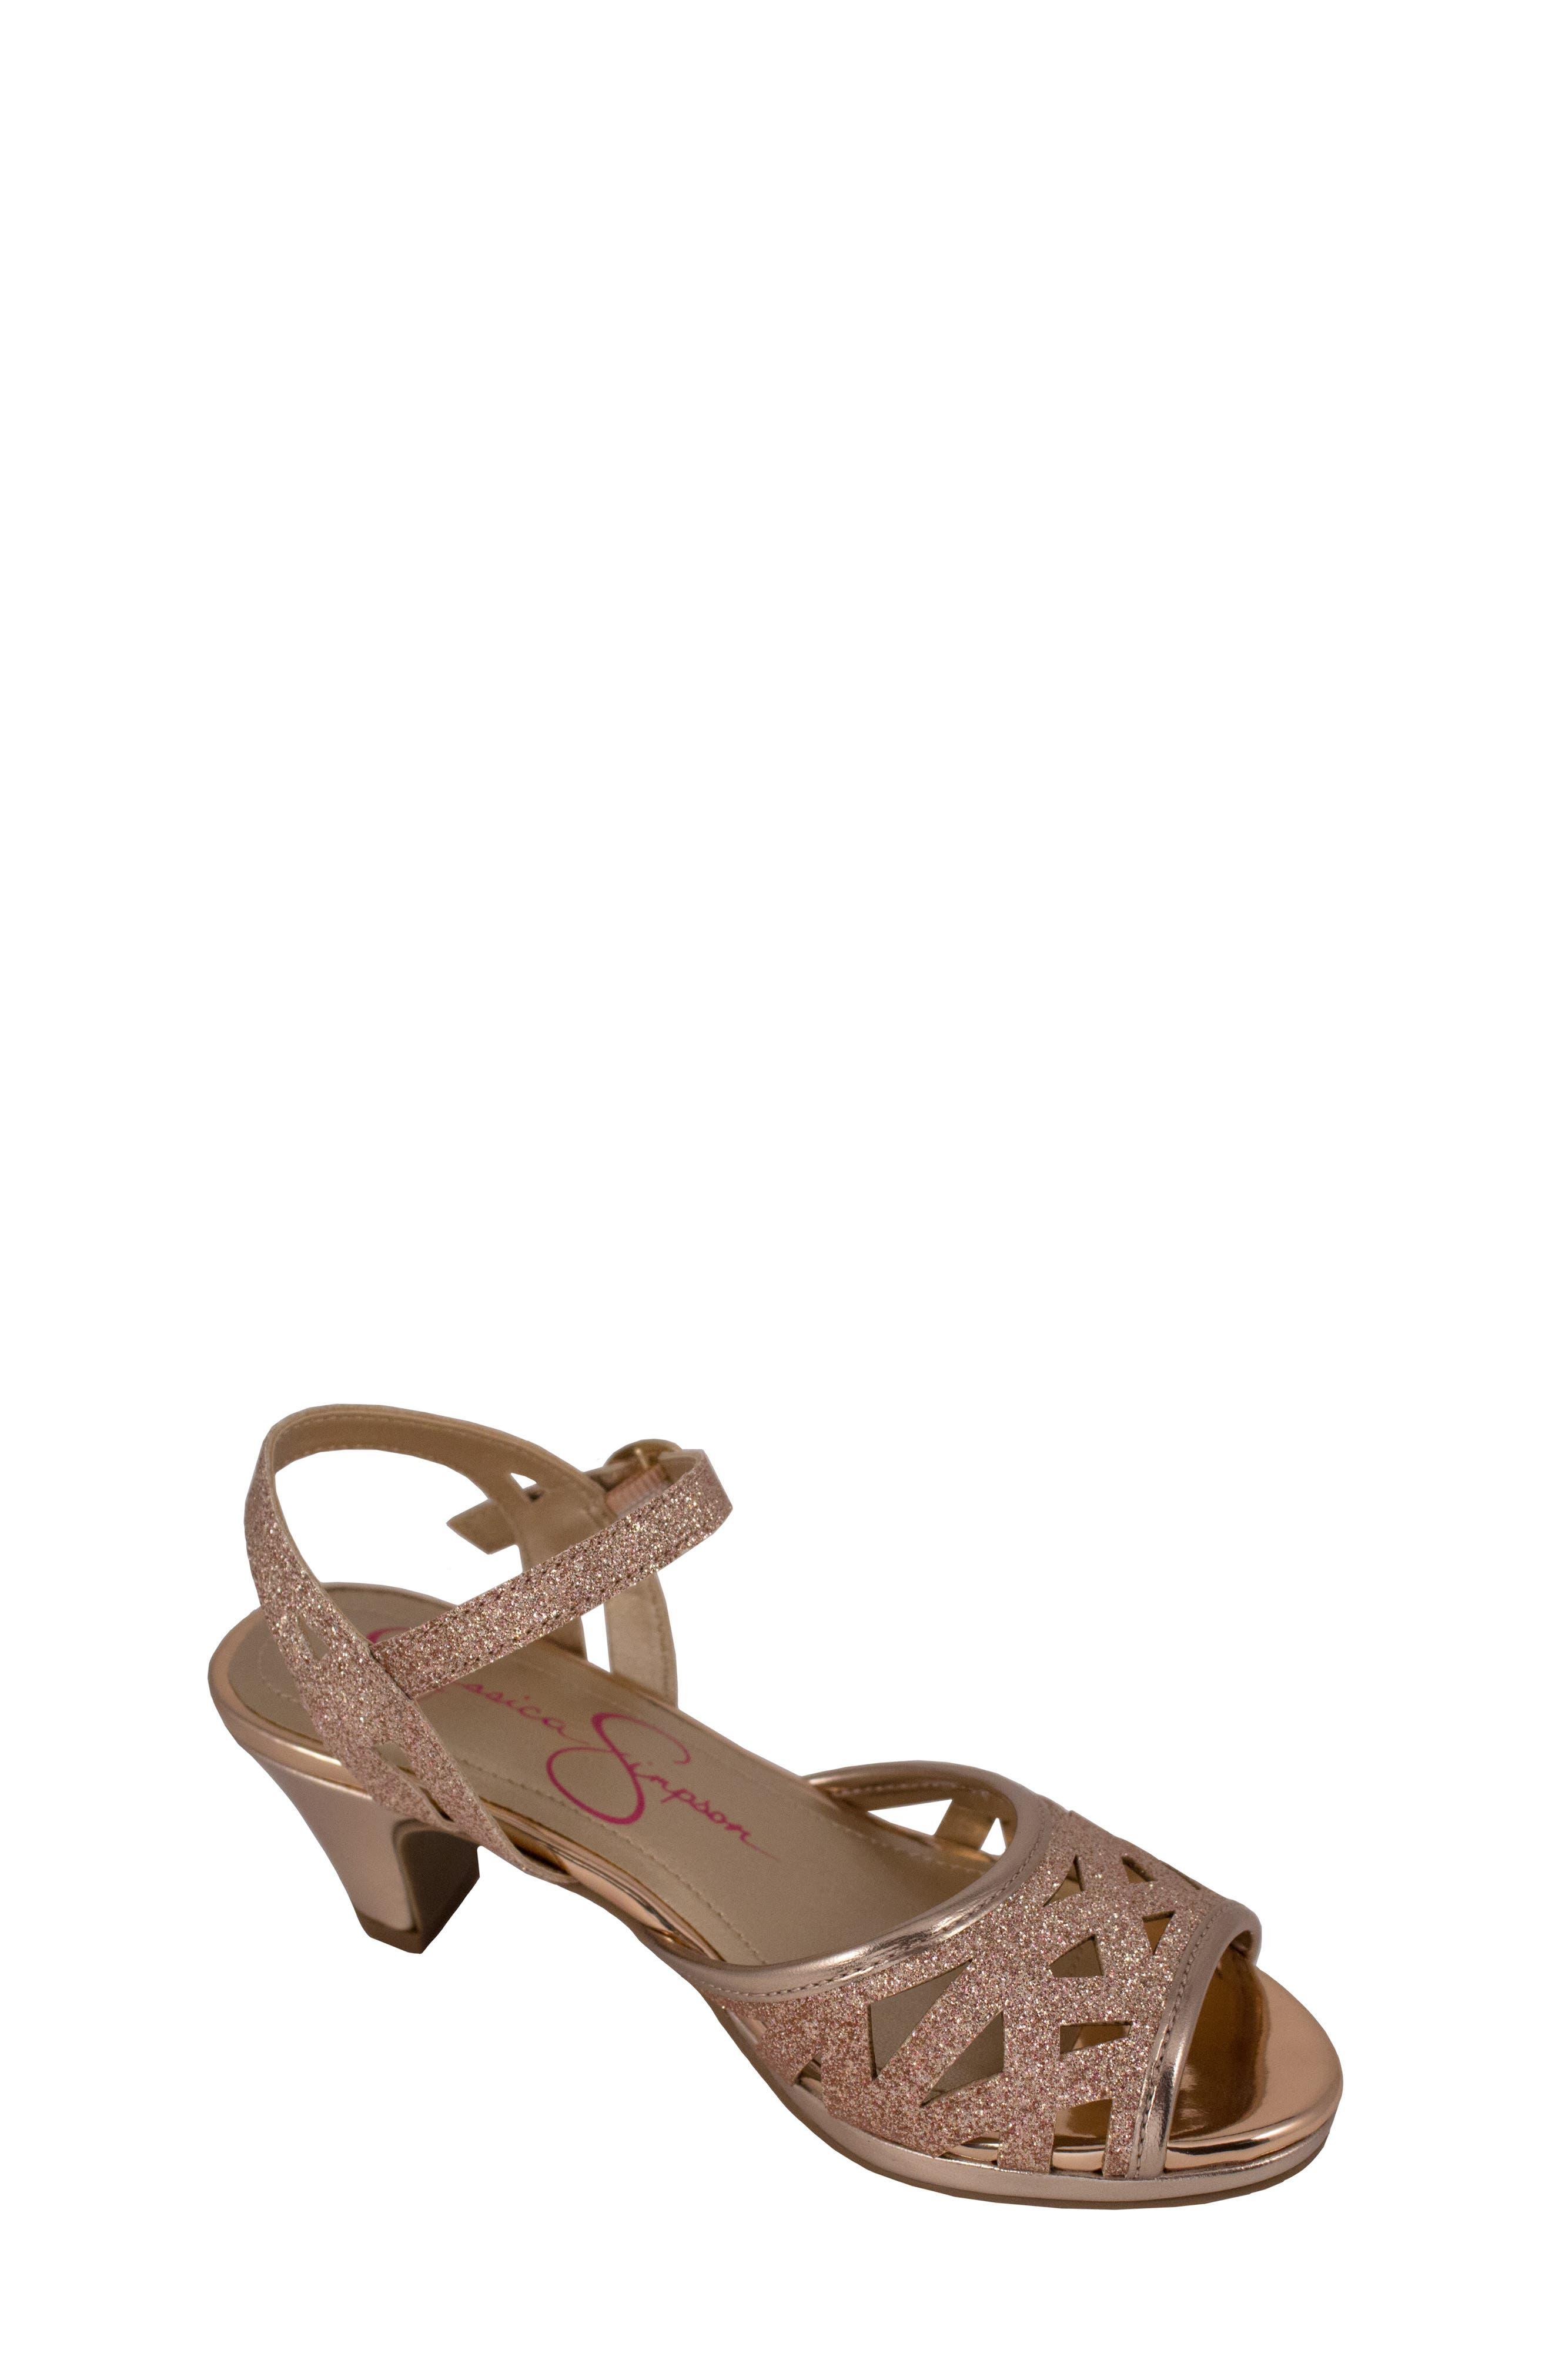 JESSICA SIMPSON Glitter Sandal, Main, color, ROSE GOLD